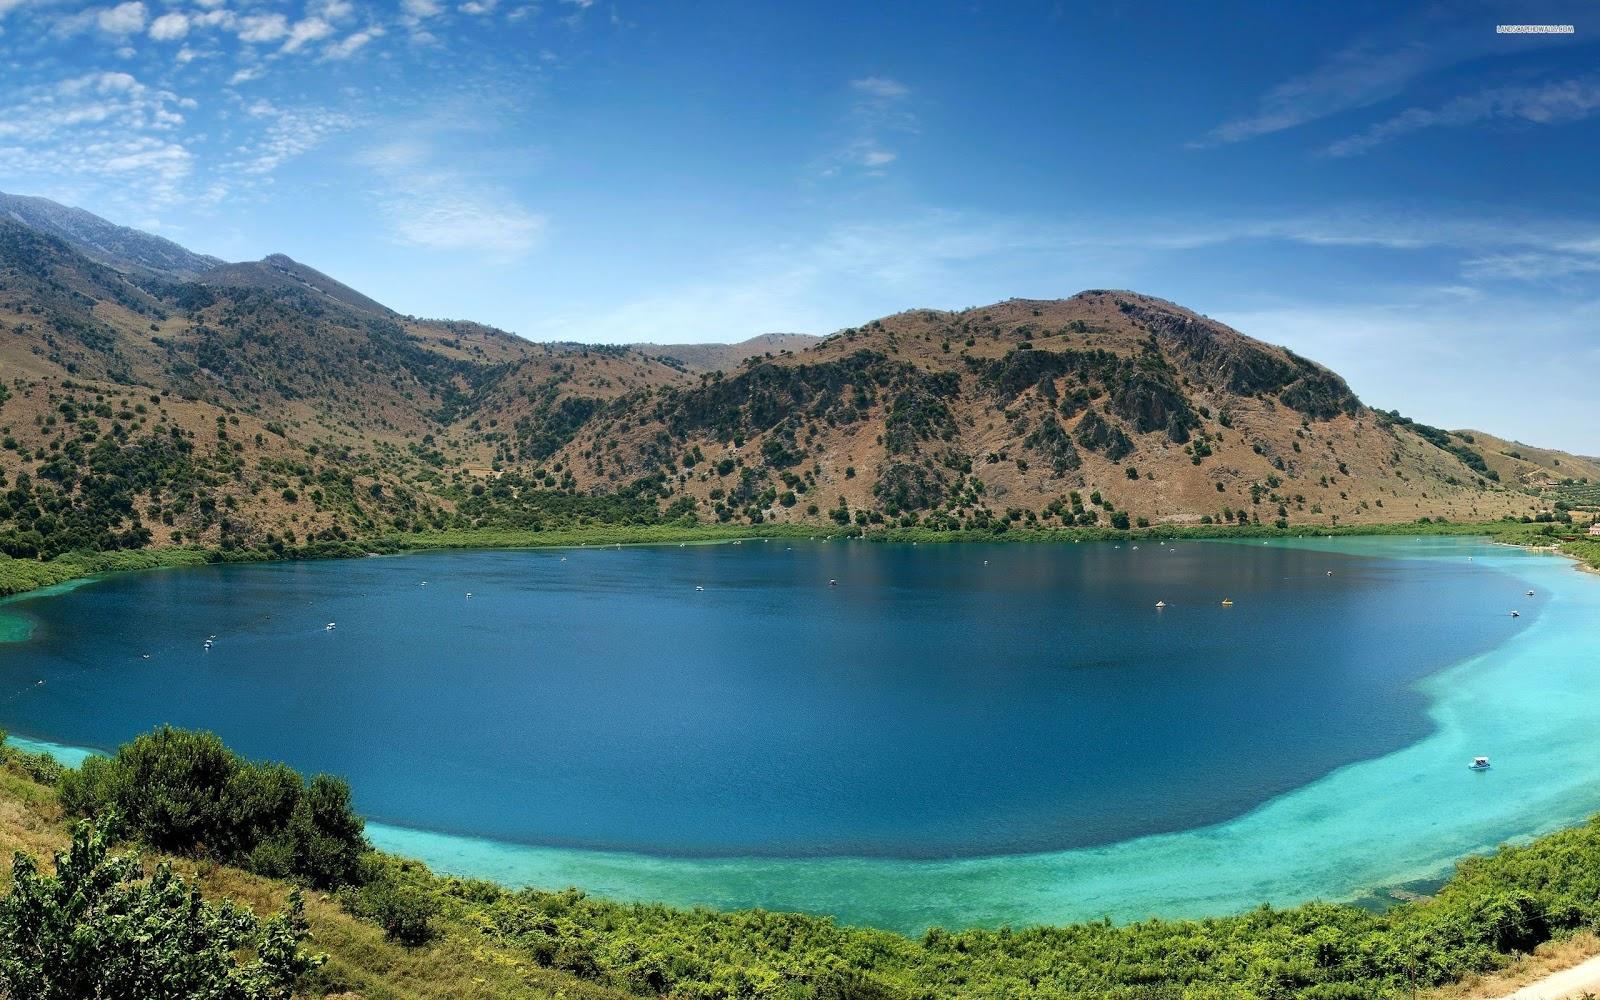 Lakes-Rivers-wetland habitat